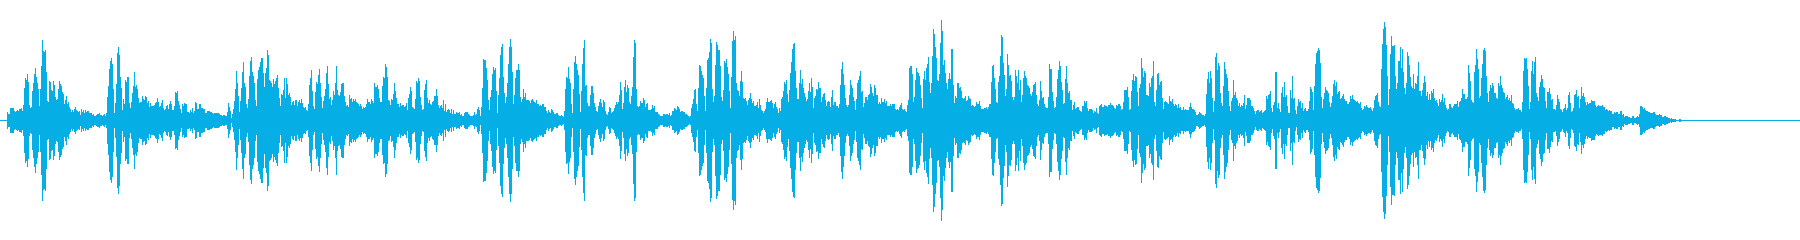 KANT 近未来宇宙人の声効果音2の再生済みの波形